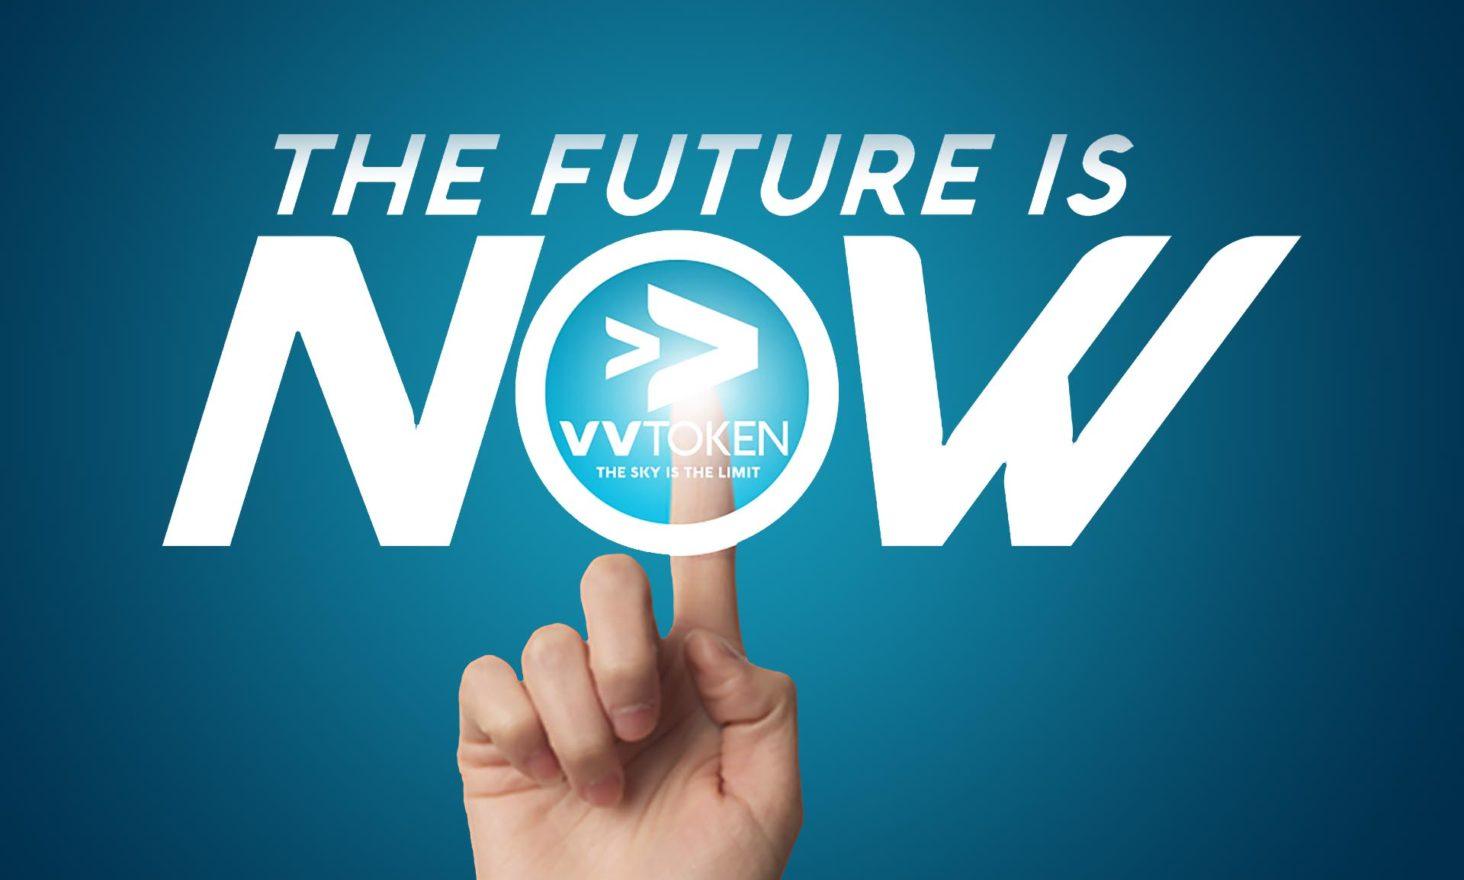 VVToken's Pre-Sale Soars, Raising Over 6 Million in Just 6 Weeks